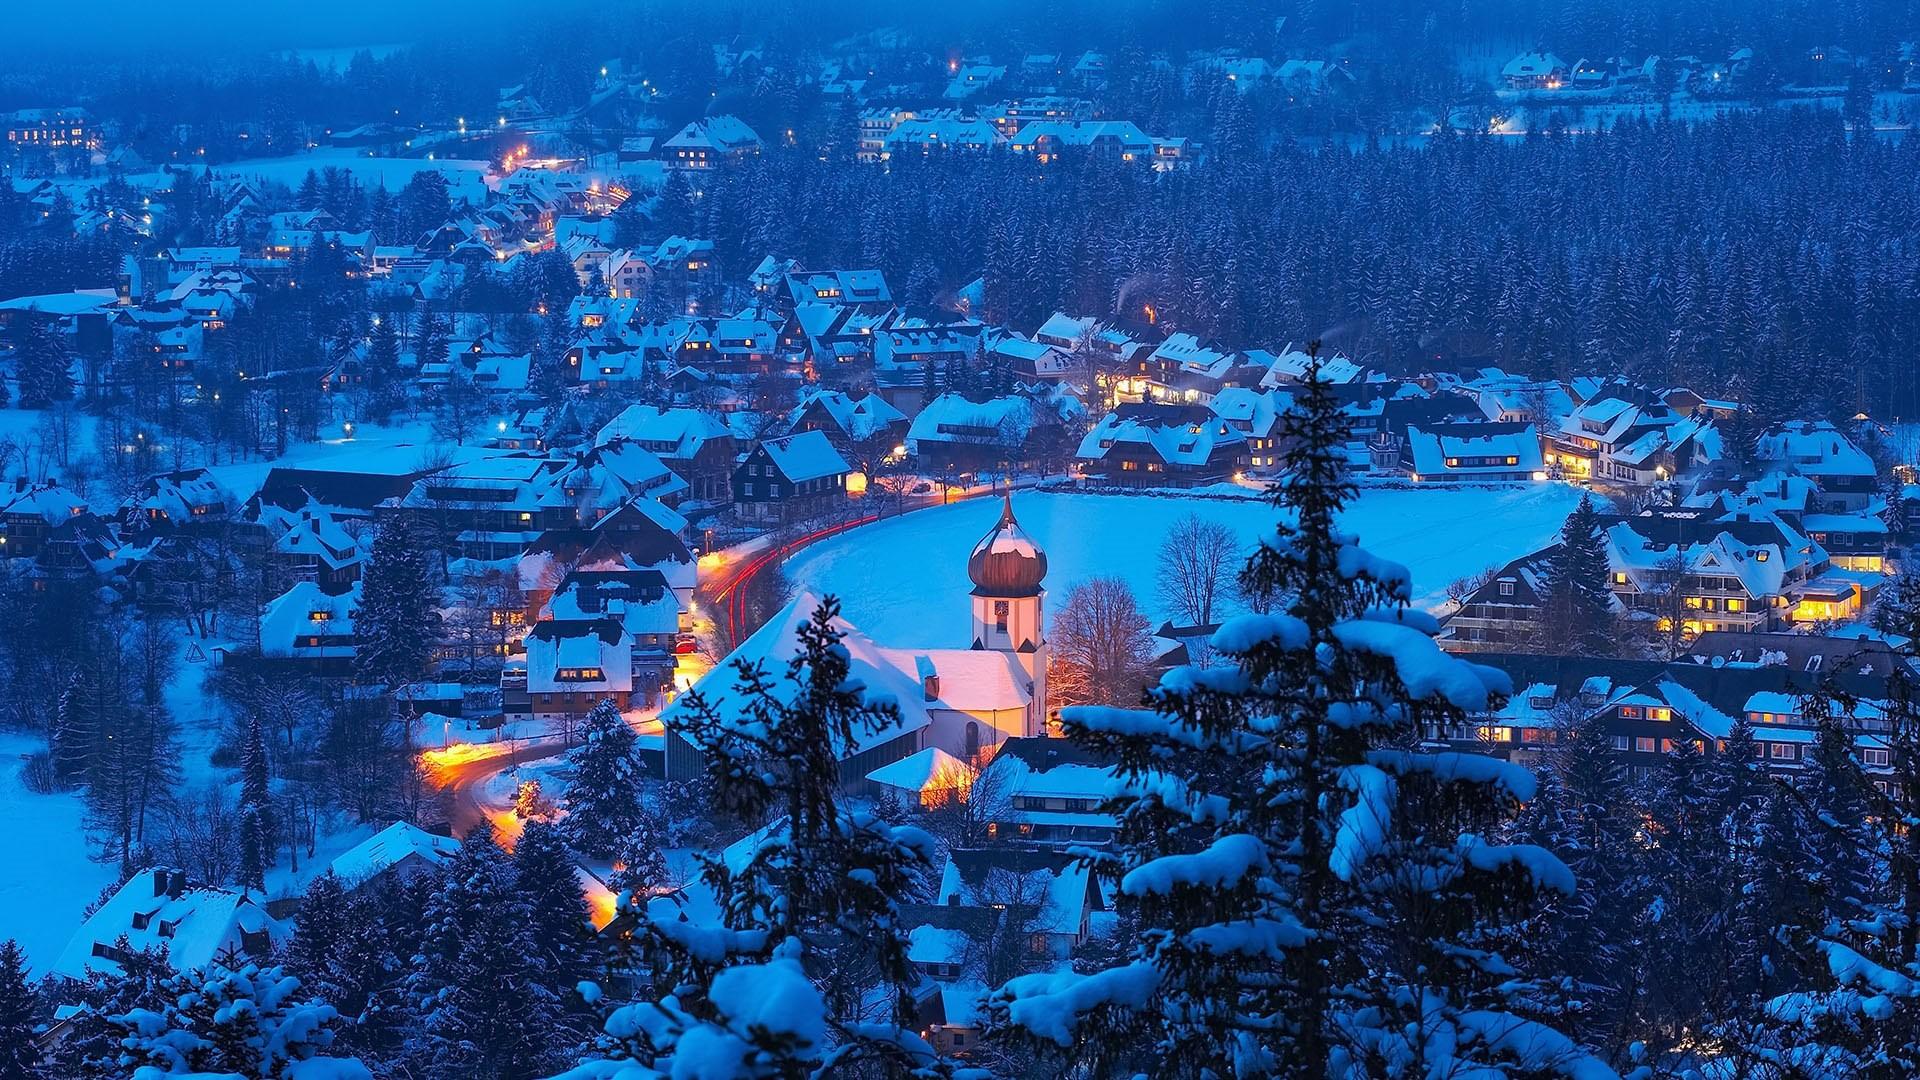 The Black Forest resort village of Hinterzarten, Germany.jpg